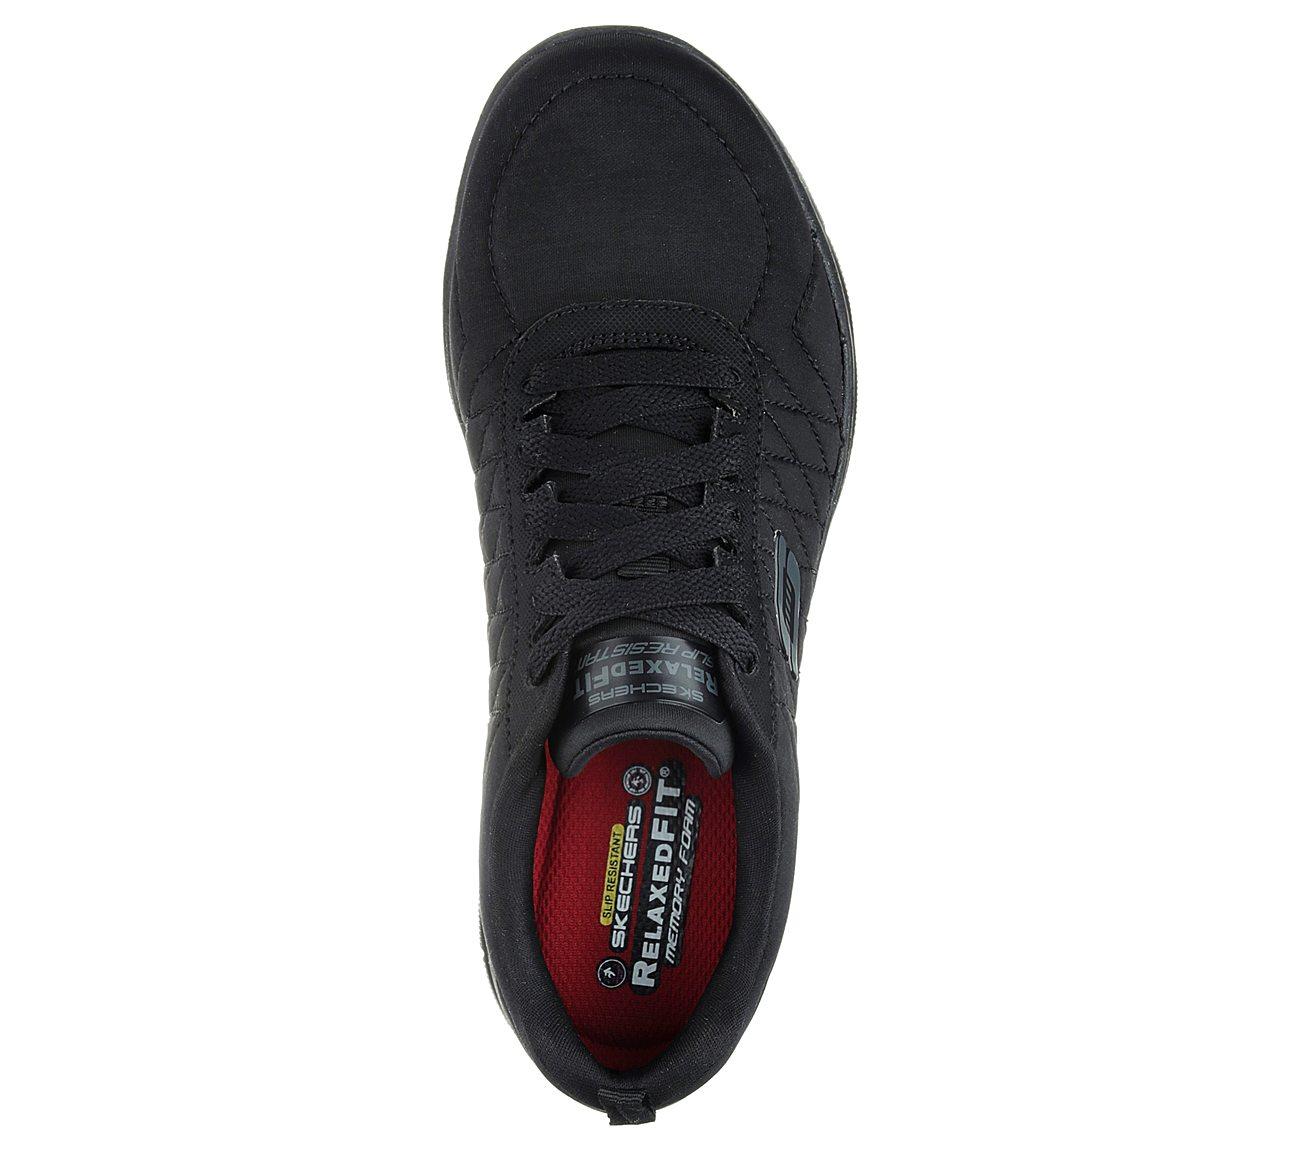 skechers slip resistant shoes with memory foam